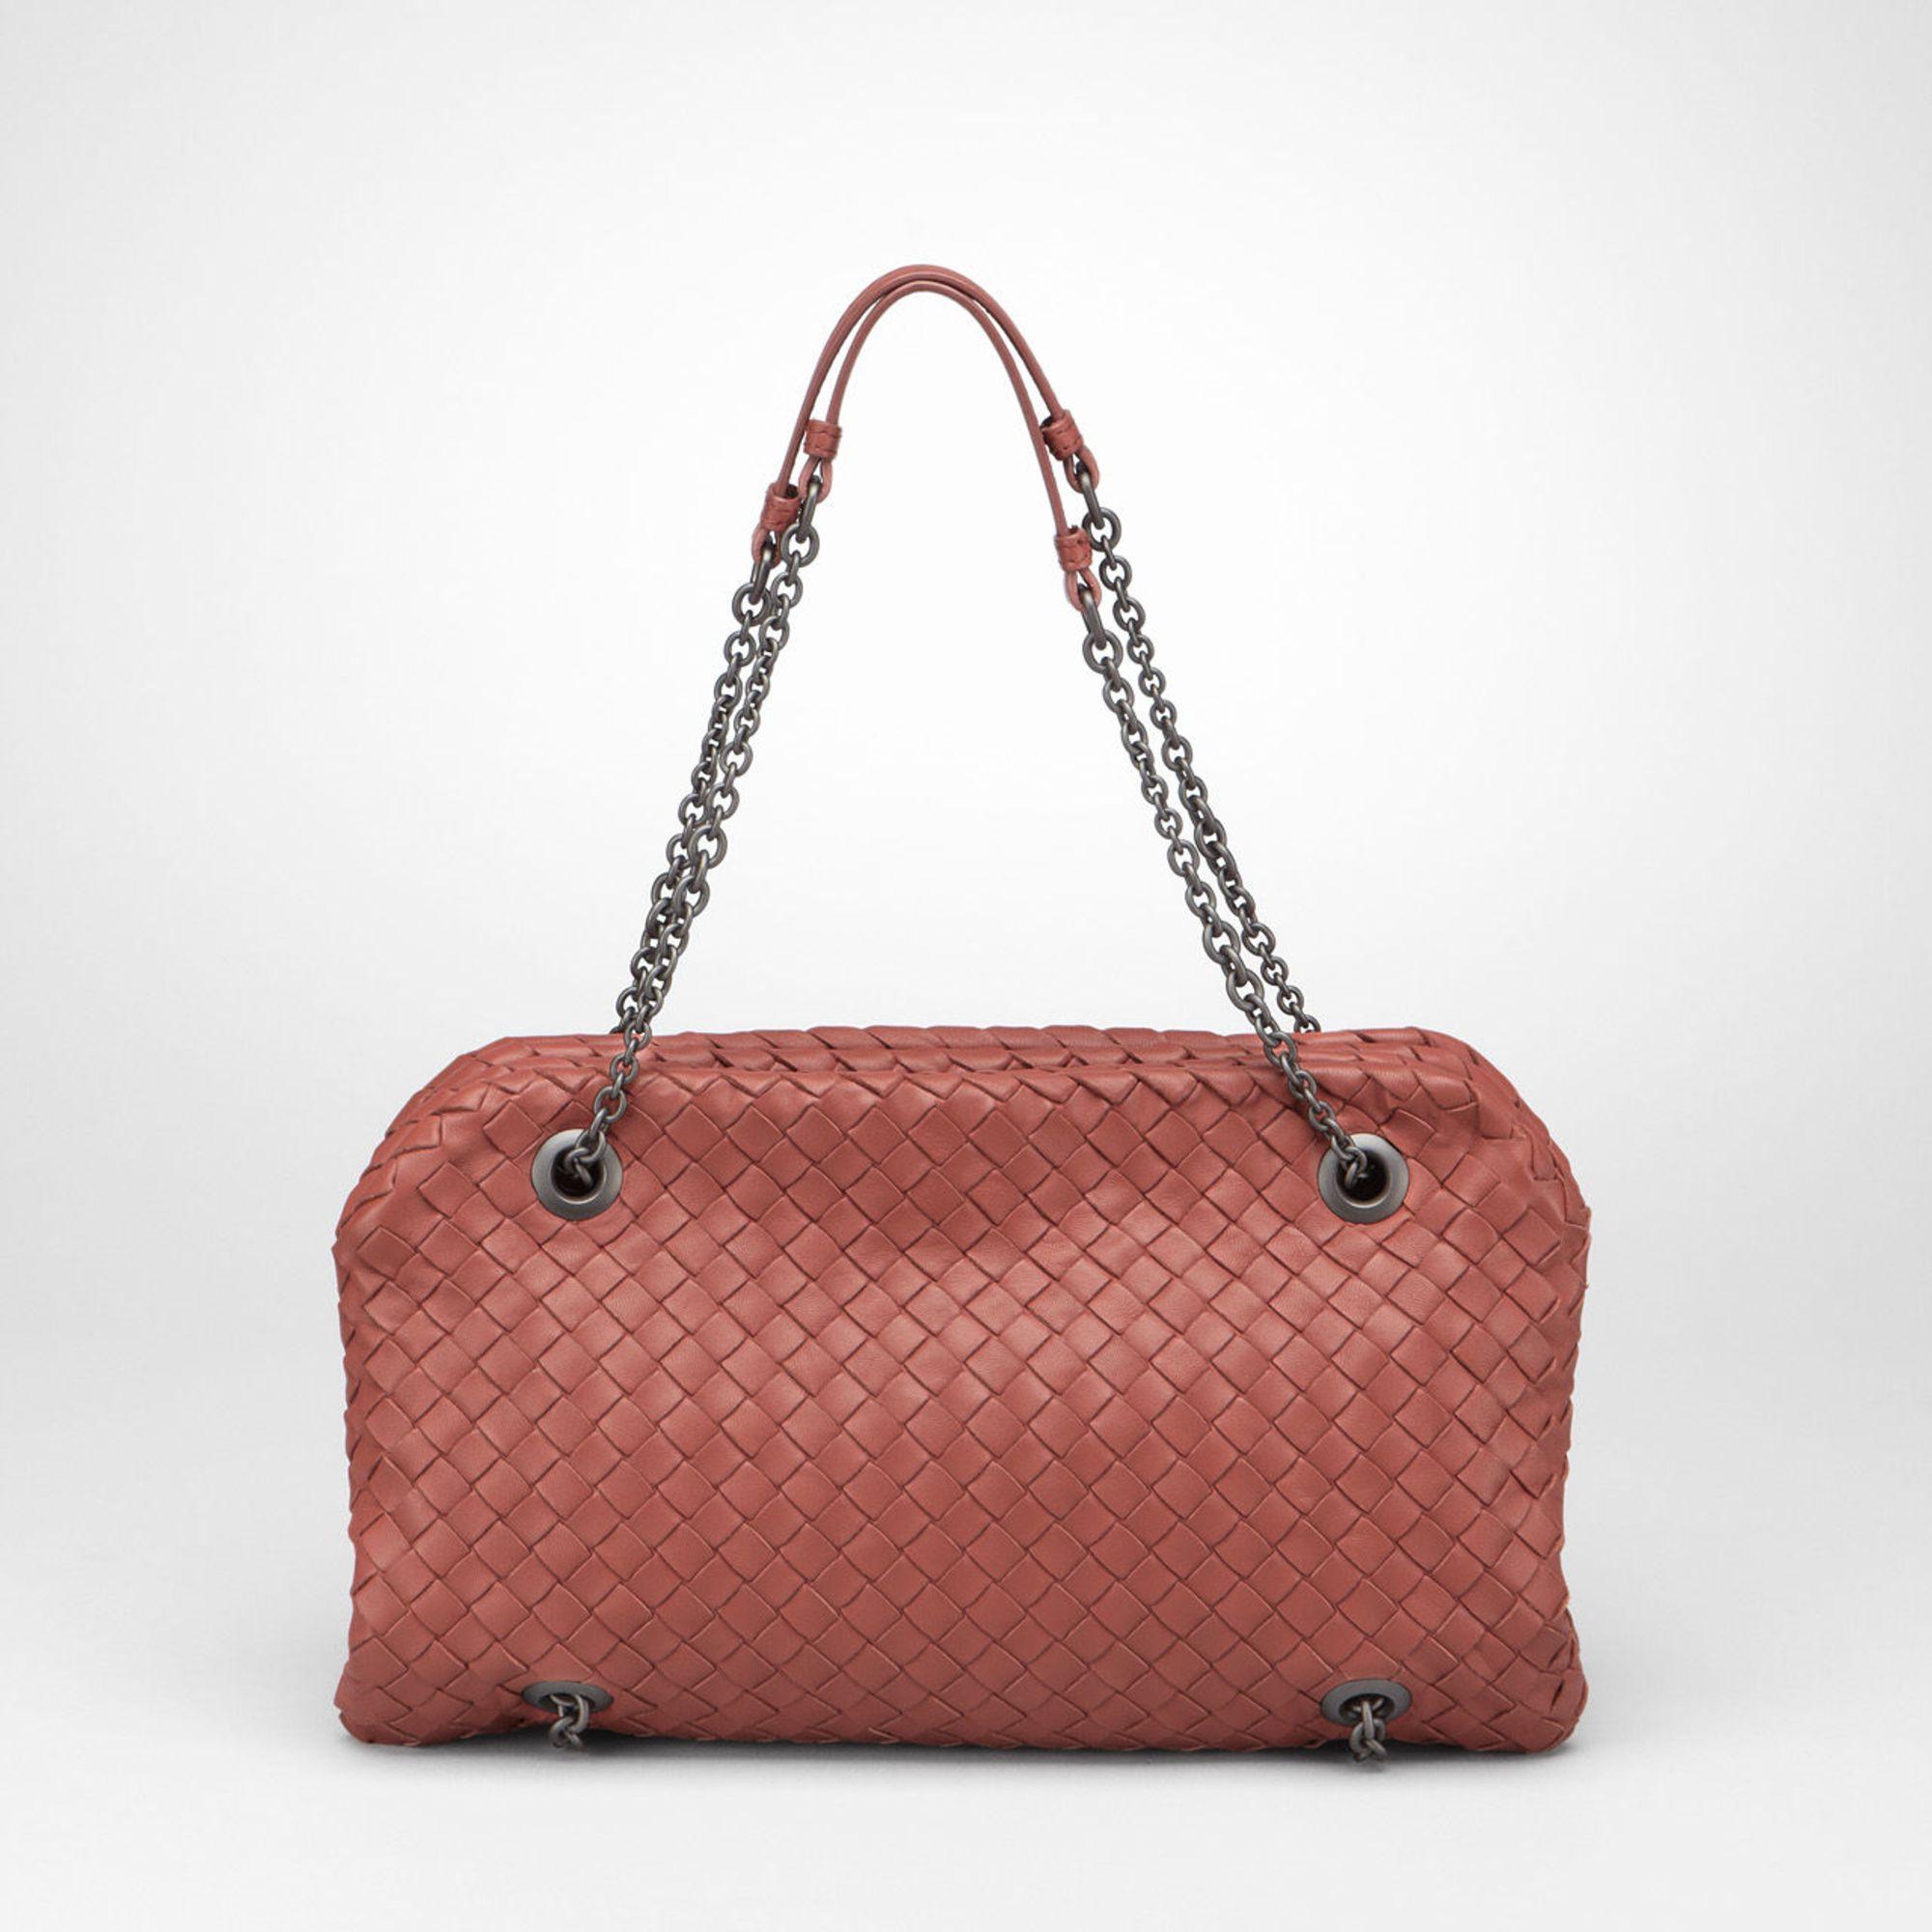 Bottega VenetaWomen's Brown Appia Intrecciato Nappa Duo Bag